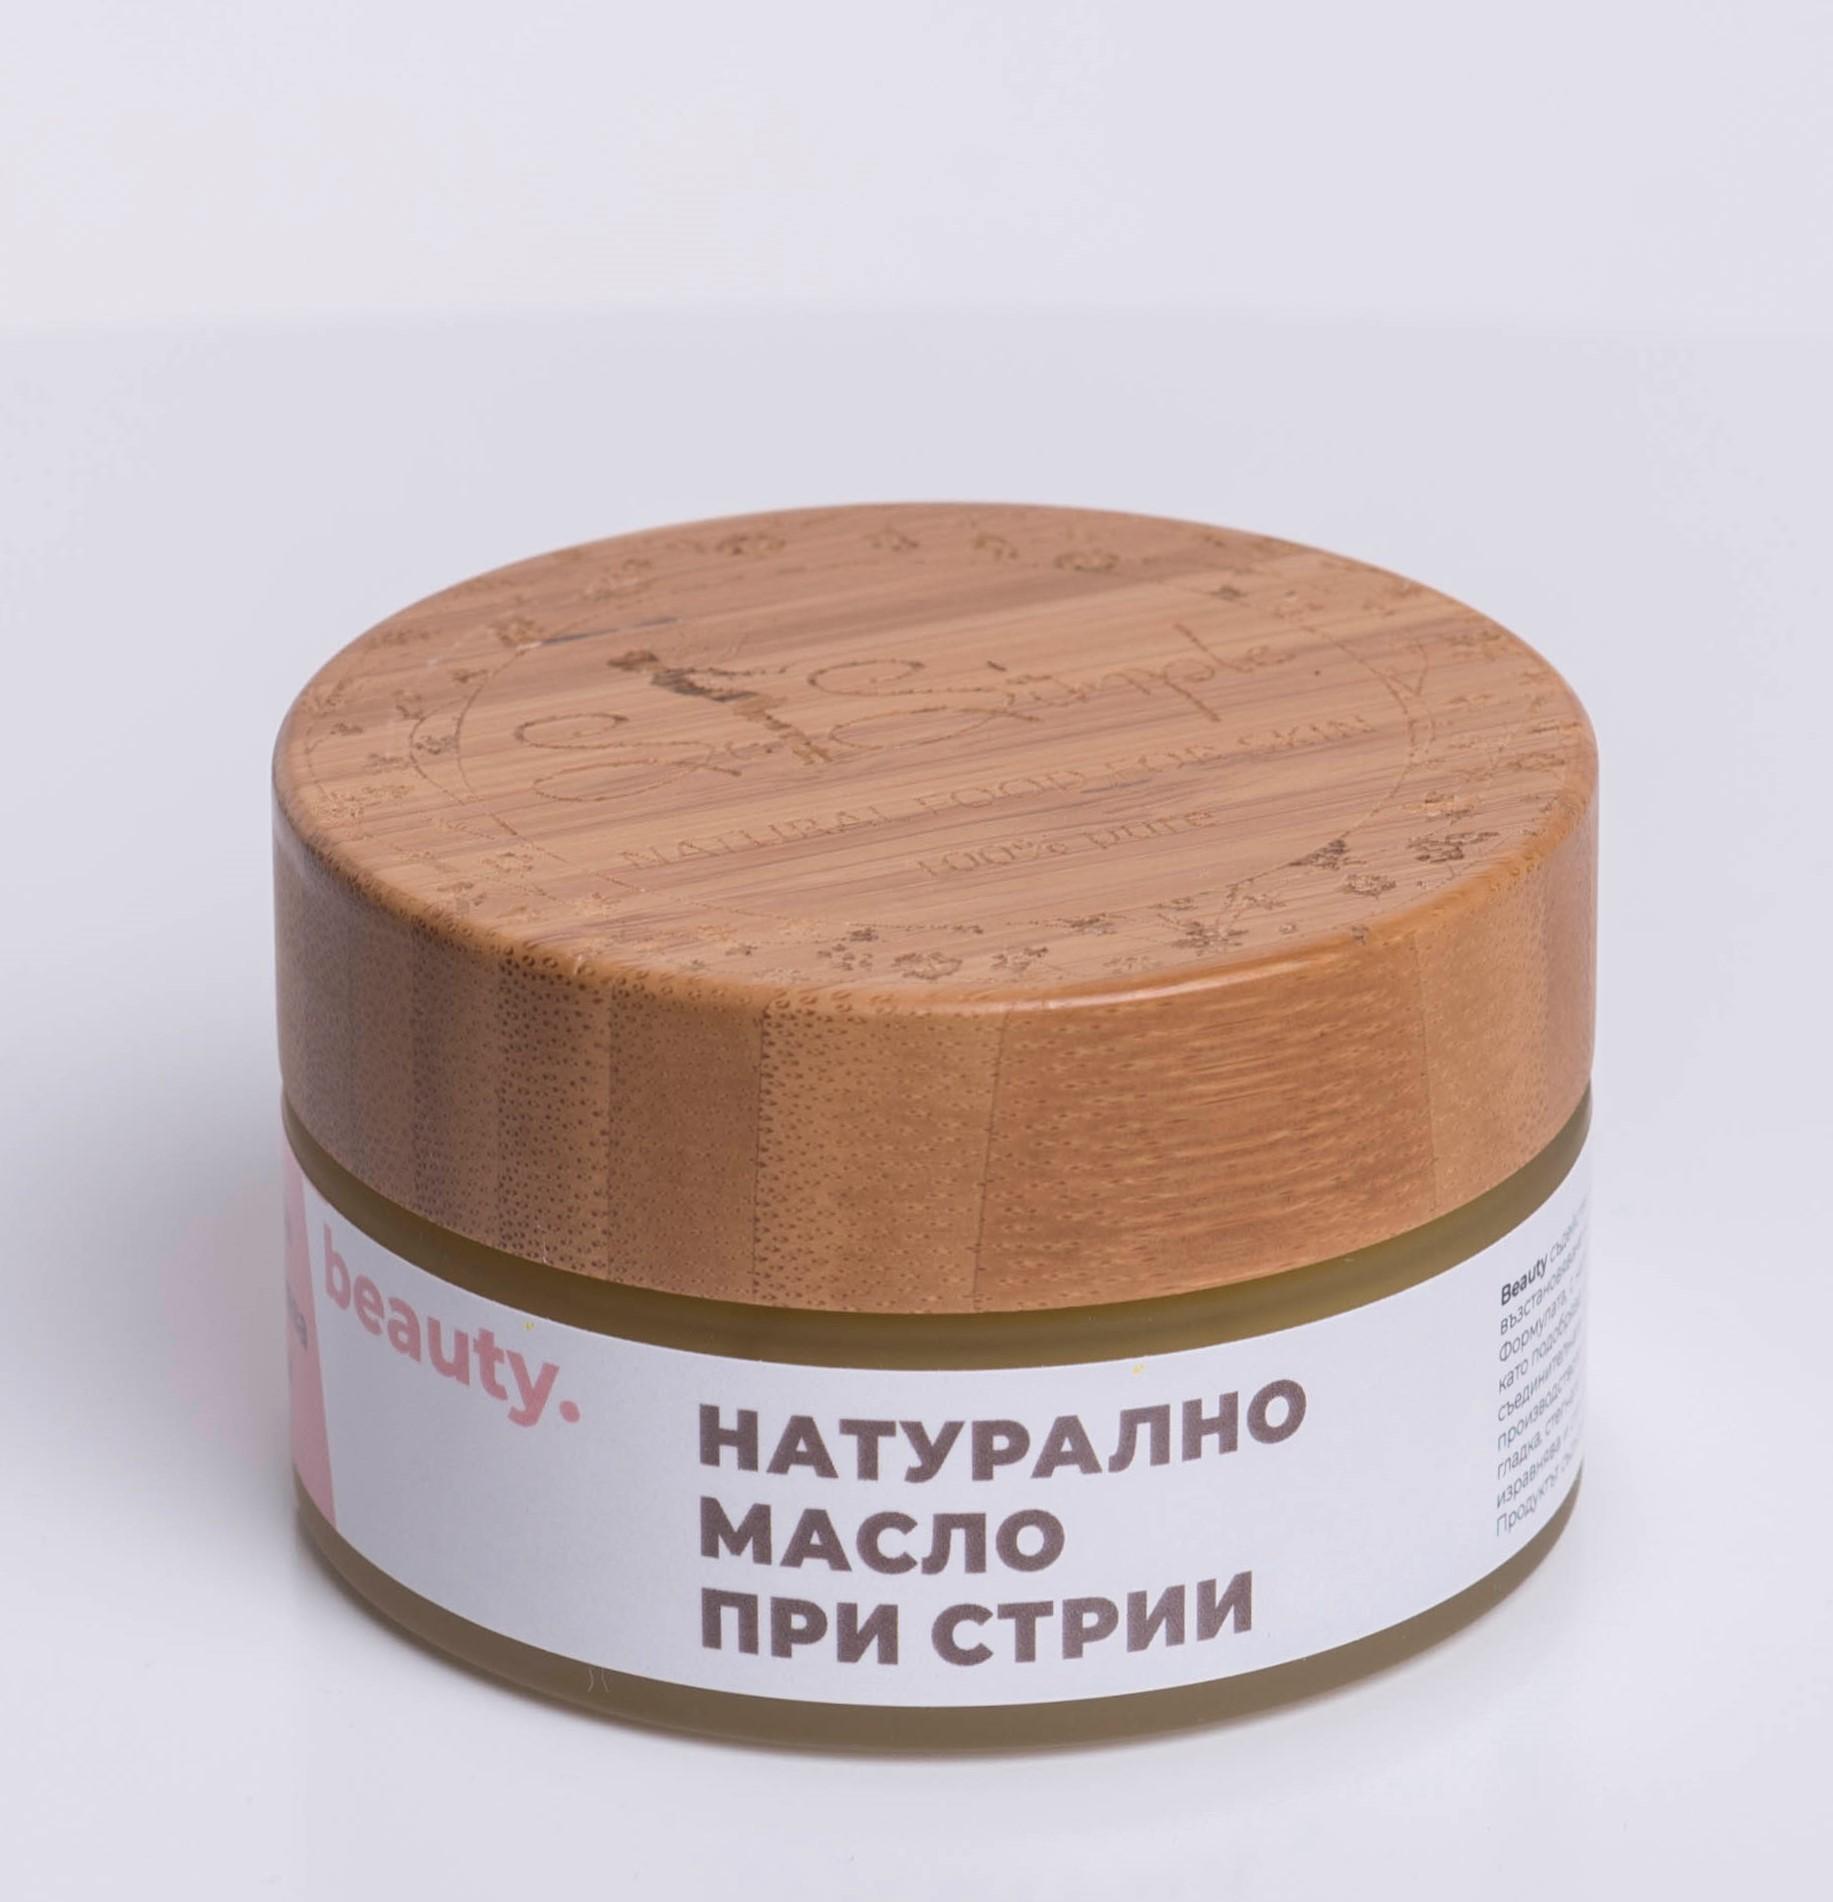 Натурално масло при стрии – BEAUTY